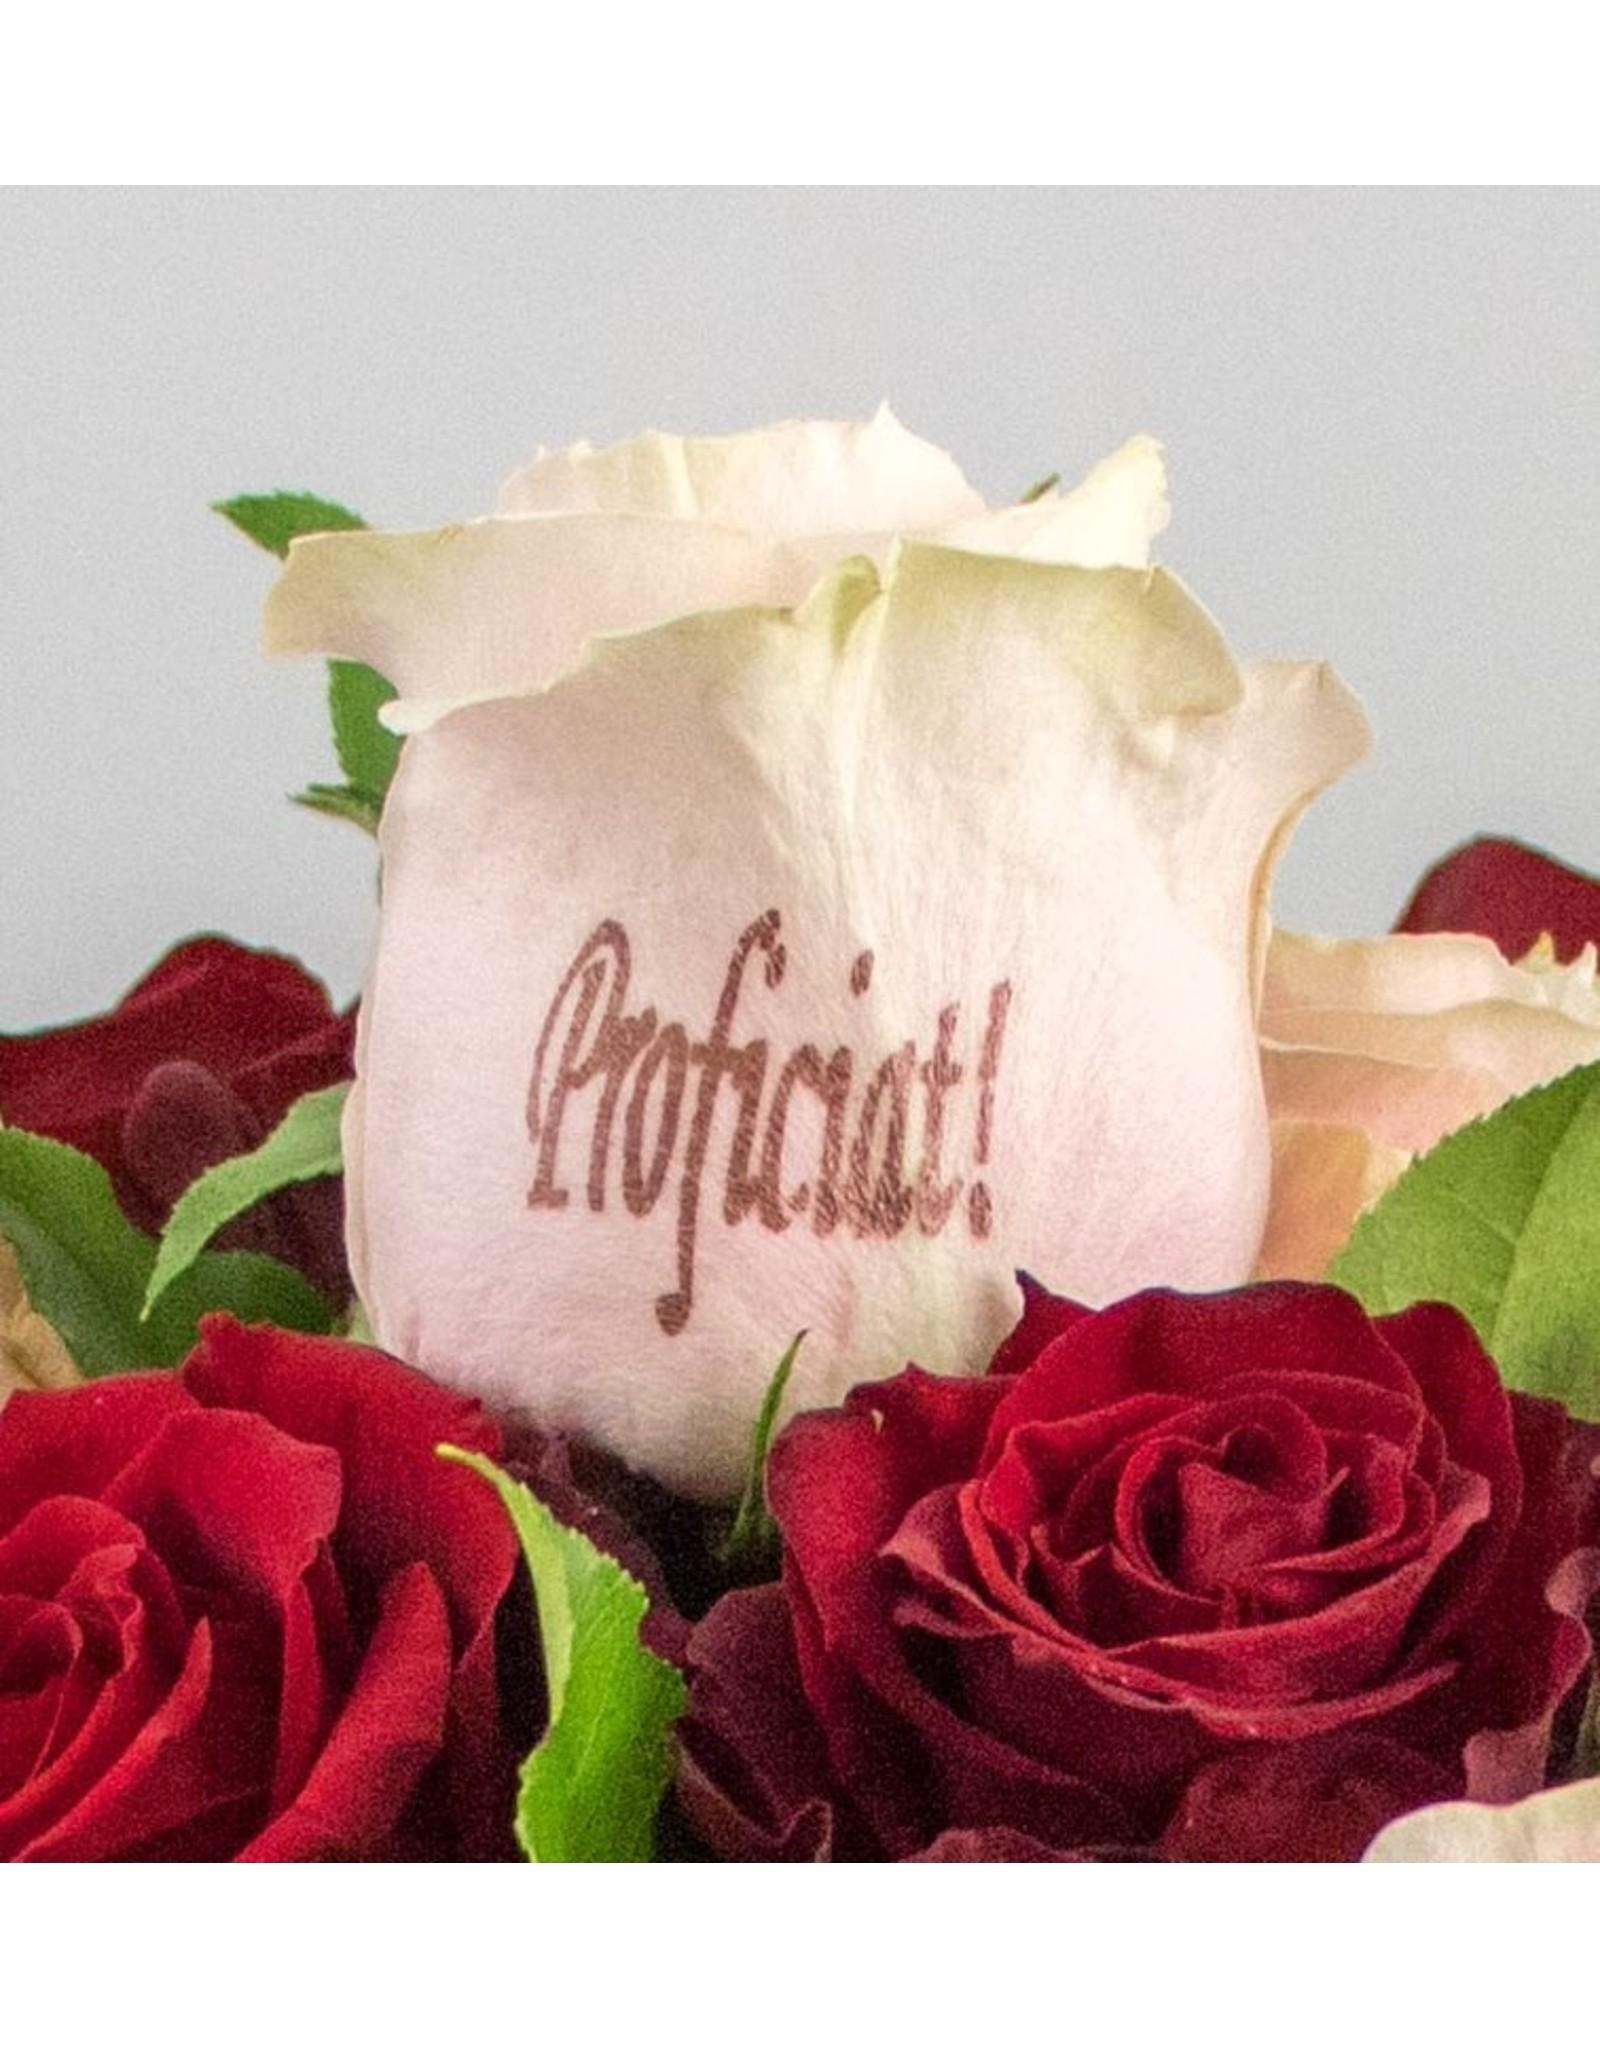 Magic Flowers Boeket 15 rozen - Rood/Roze - Proficiat